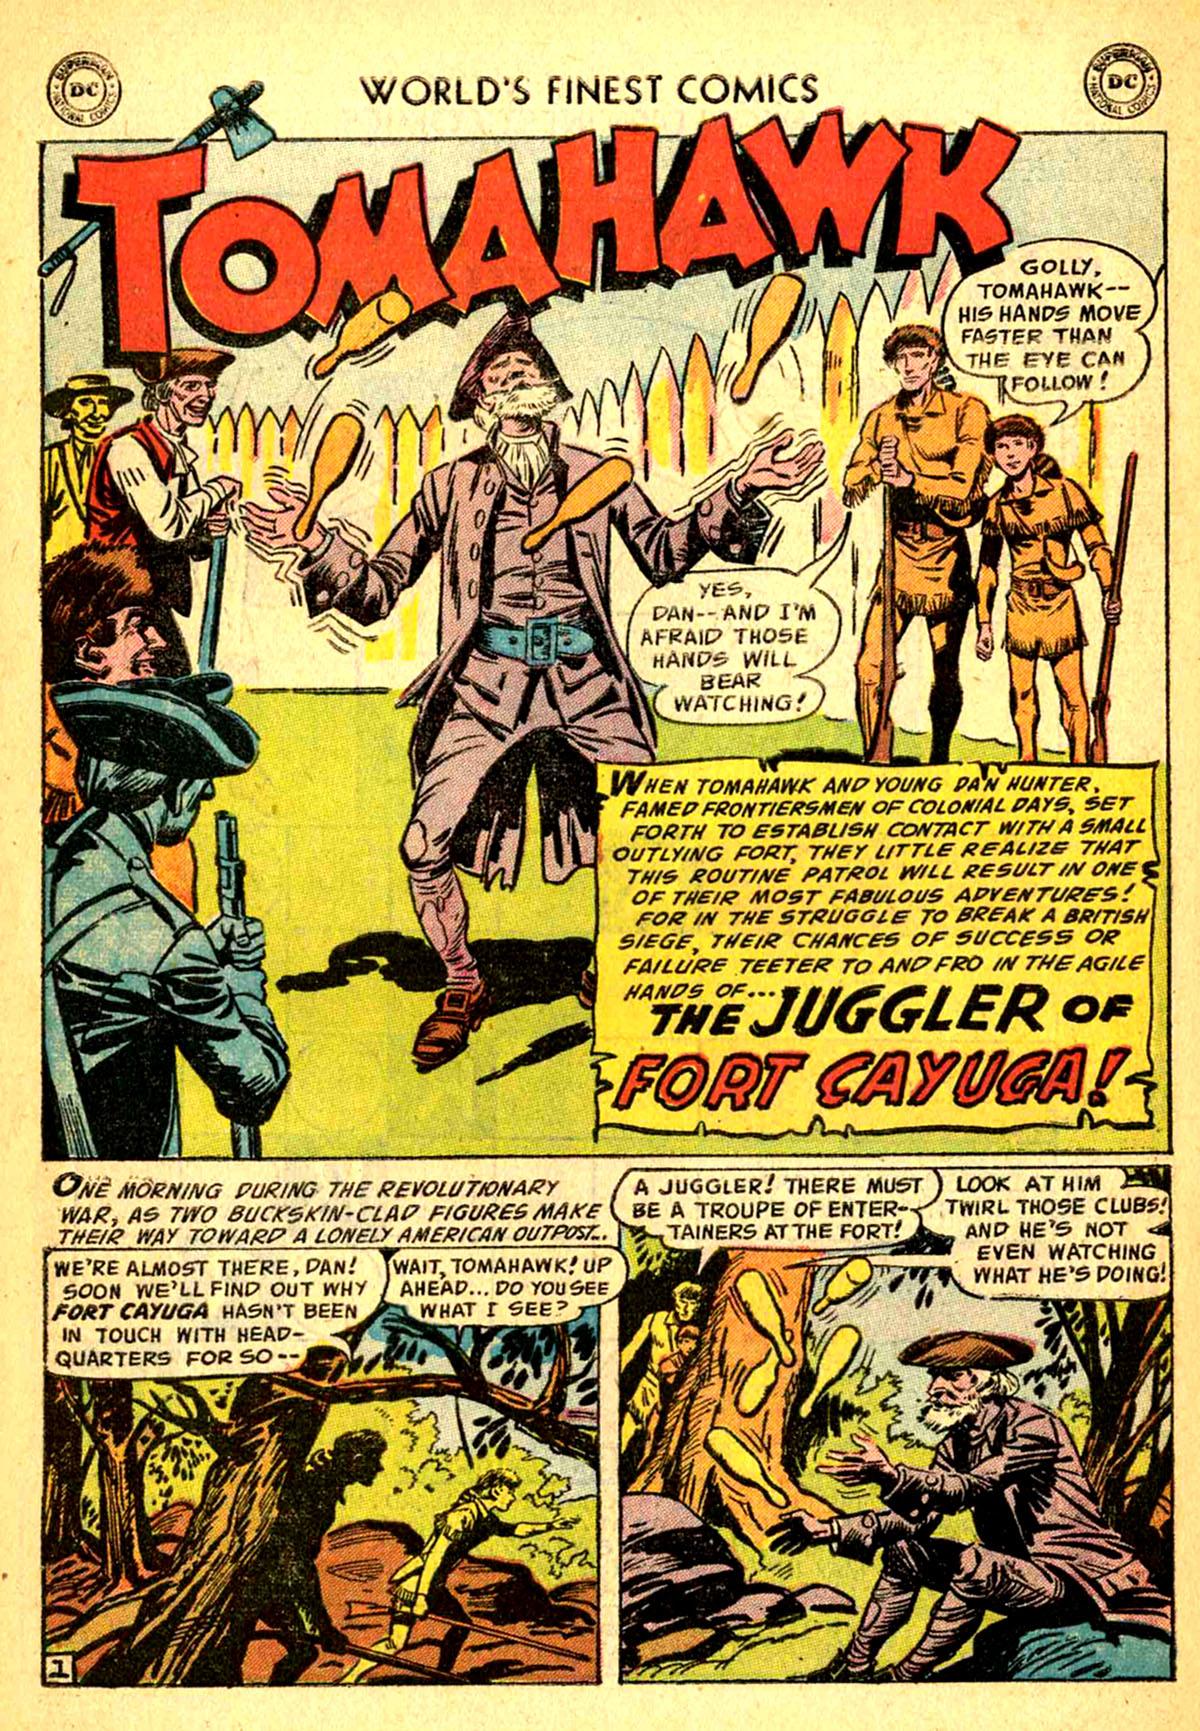 Read online World's Finest Comics comic -  Issue #77 - 28